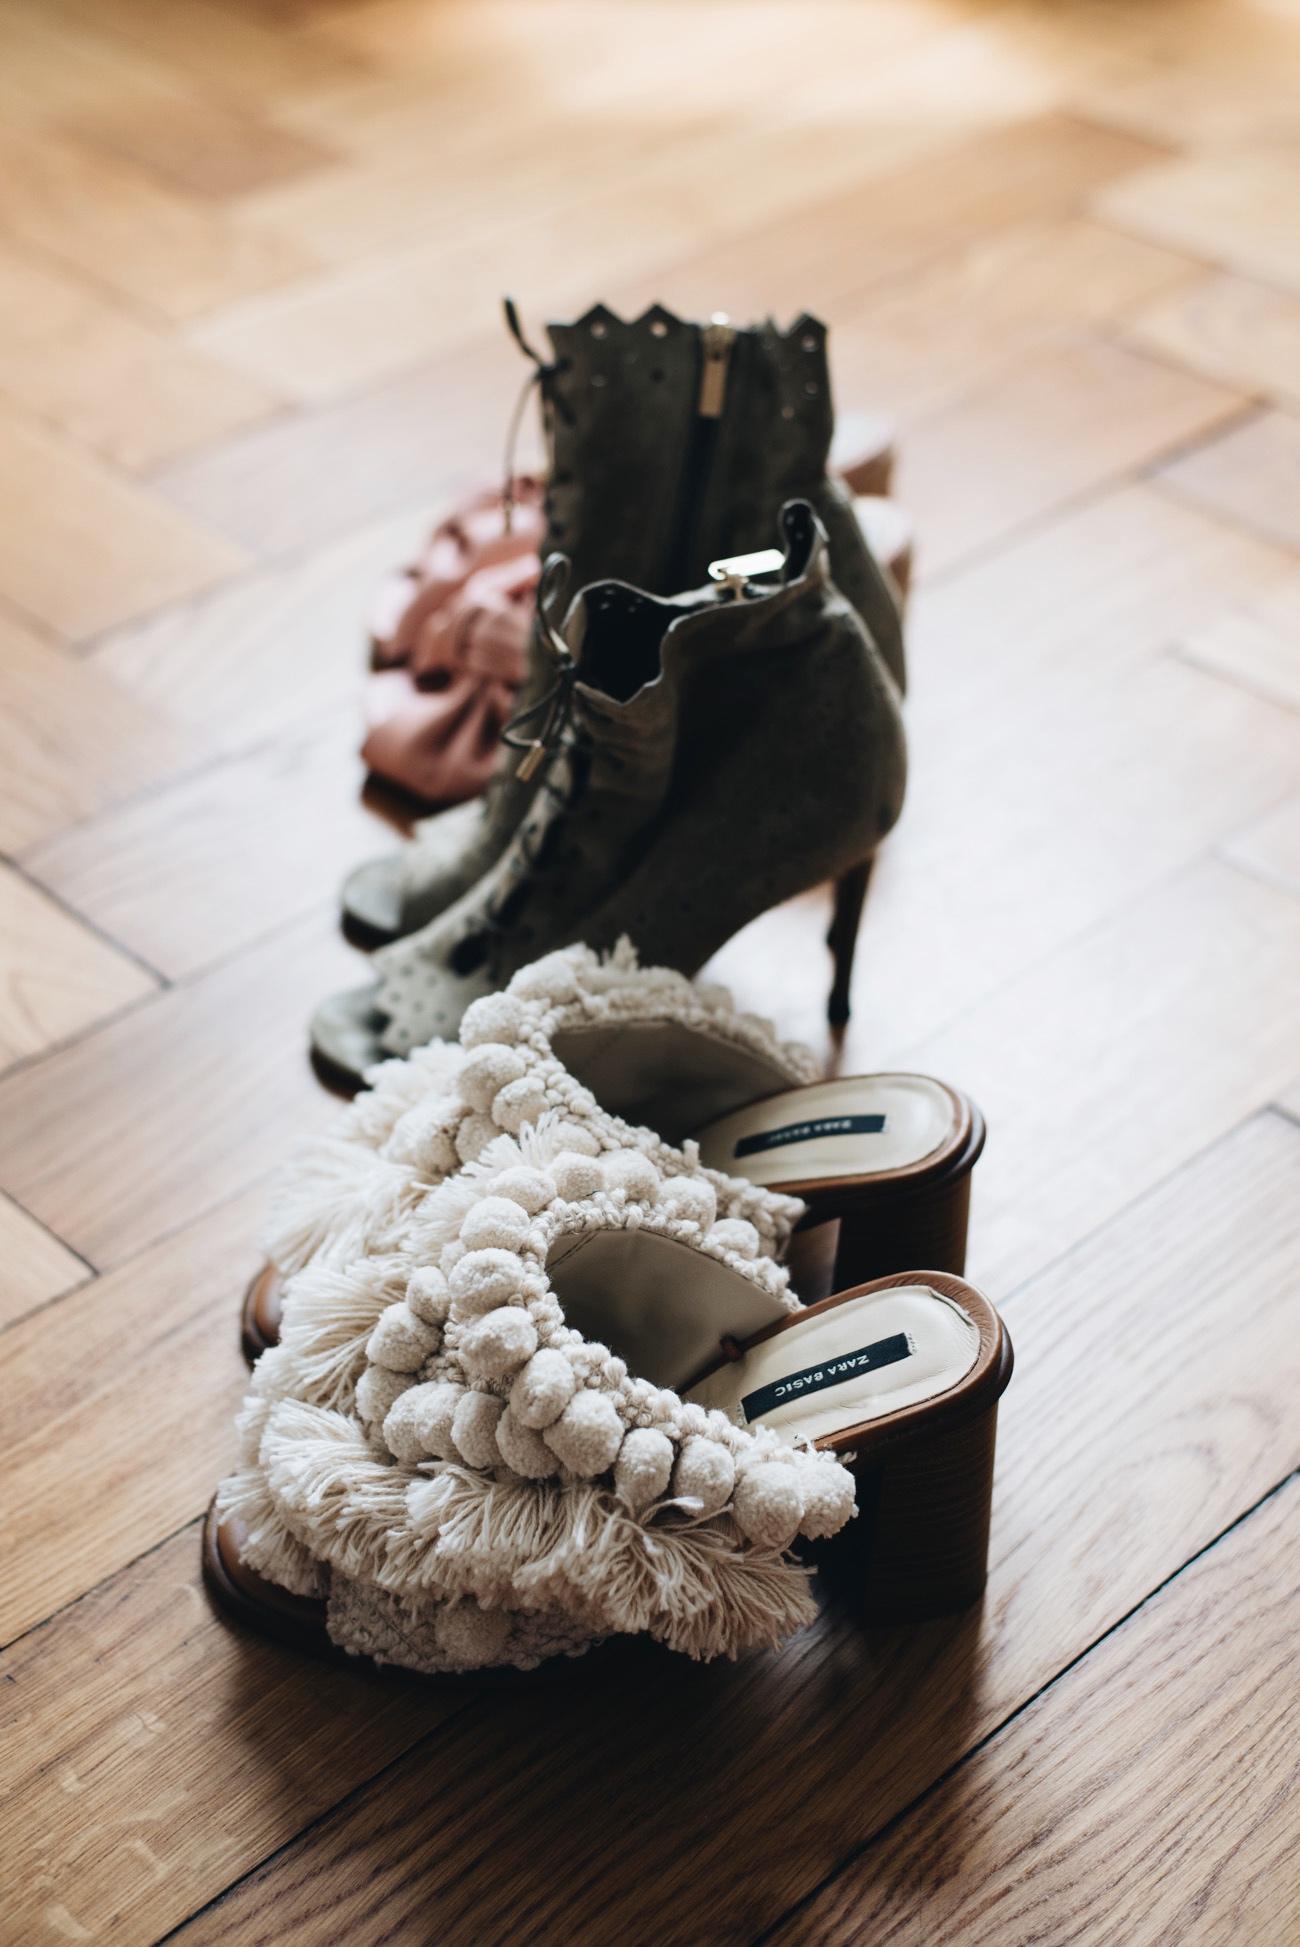 Palmoa-barceló-bow-sandalen-mit-schleife-rosa-pink-zara-bommel-schlappen-fashiioncarpet